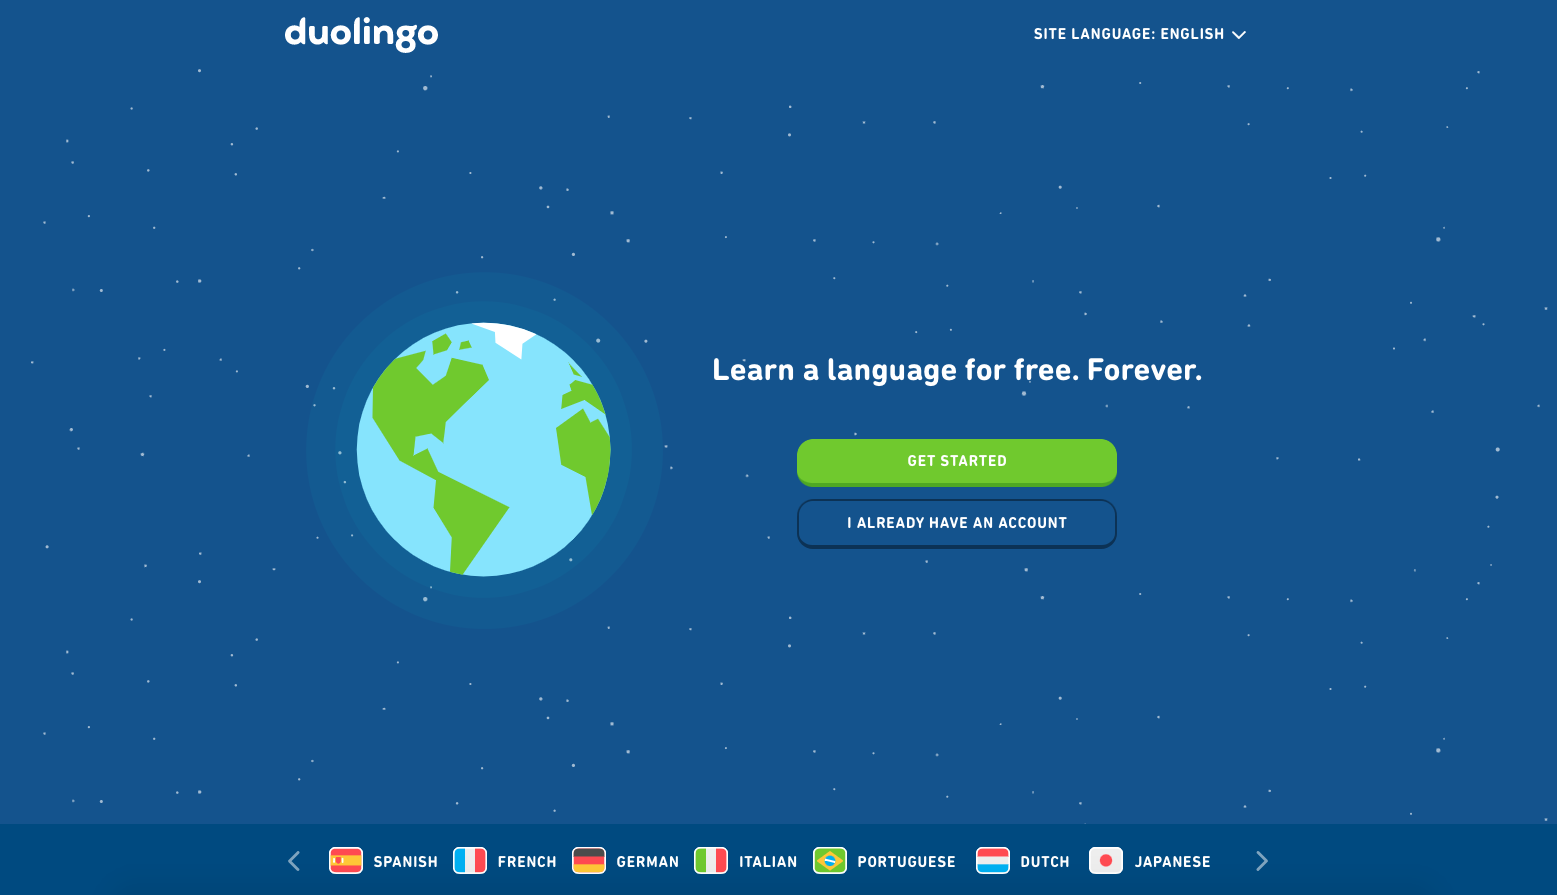 Duolingo opening landing page